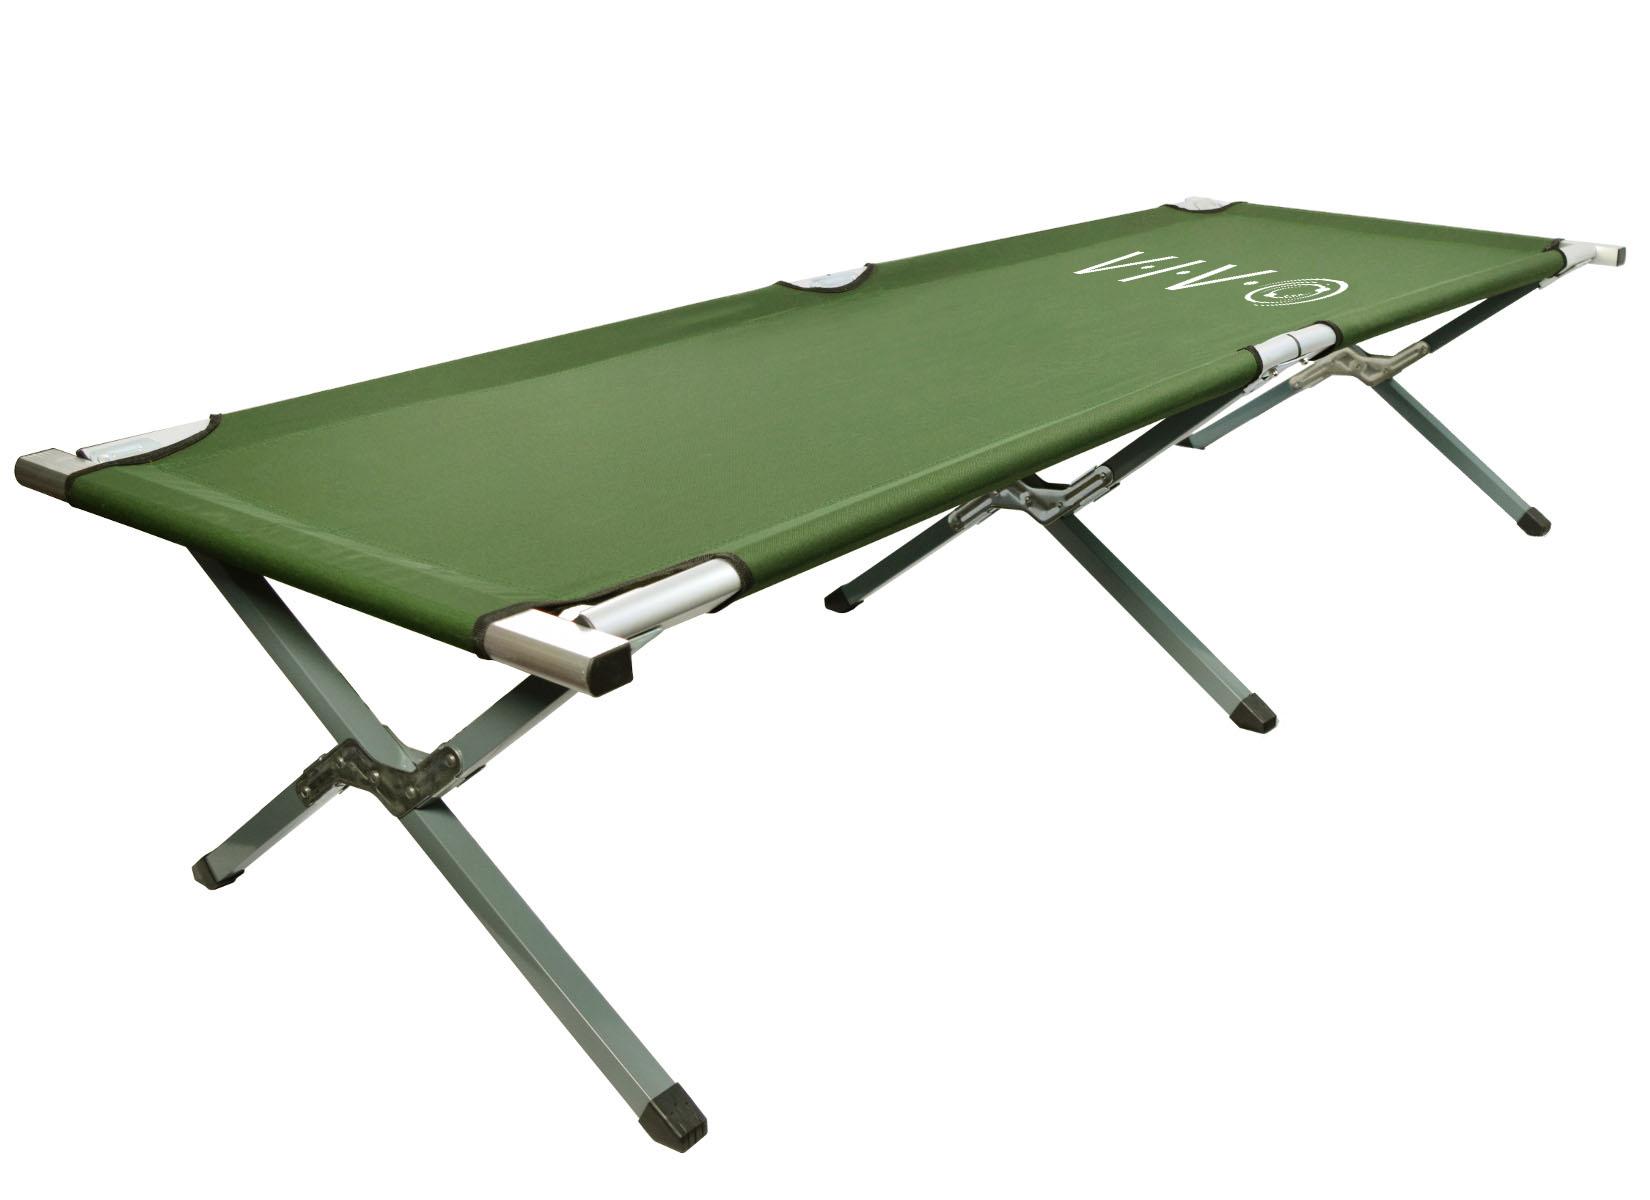 - Vivo Grün Camping Feldbett, Zusammenklappen Bett, Military Style Wiege,  Tragetasche Enthalten EBay